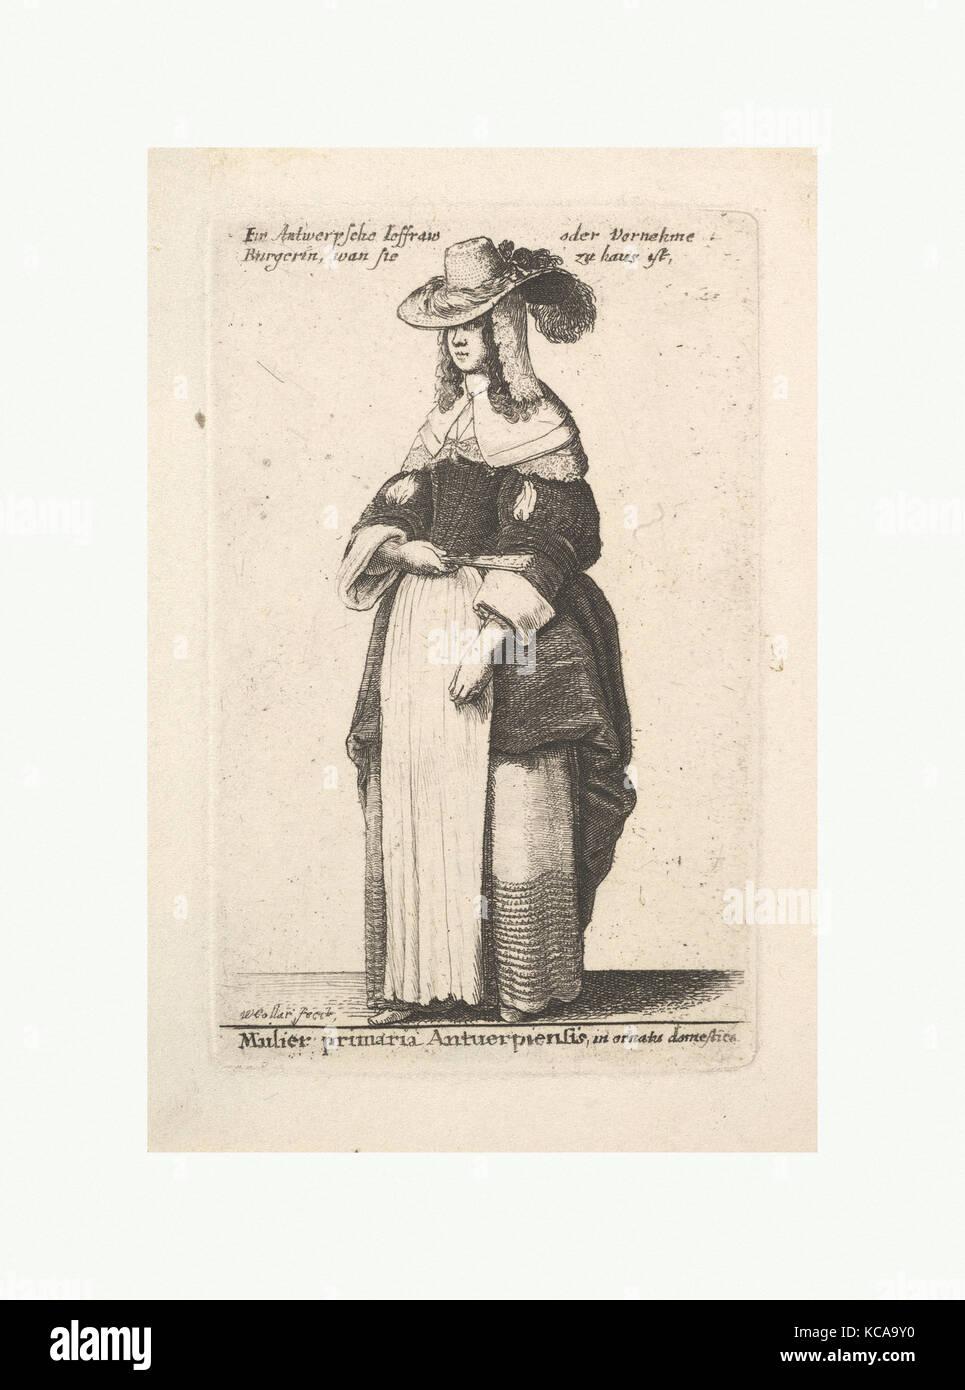 Mulier primaria Antuerpiensis, in ornatus domestica (Gentlewoman of Antwerp  in domestic adornment),